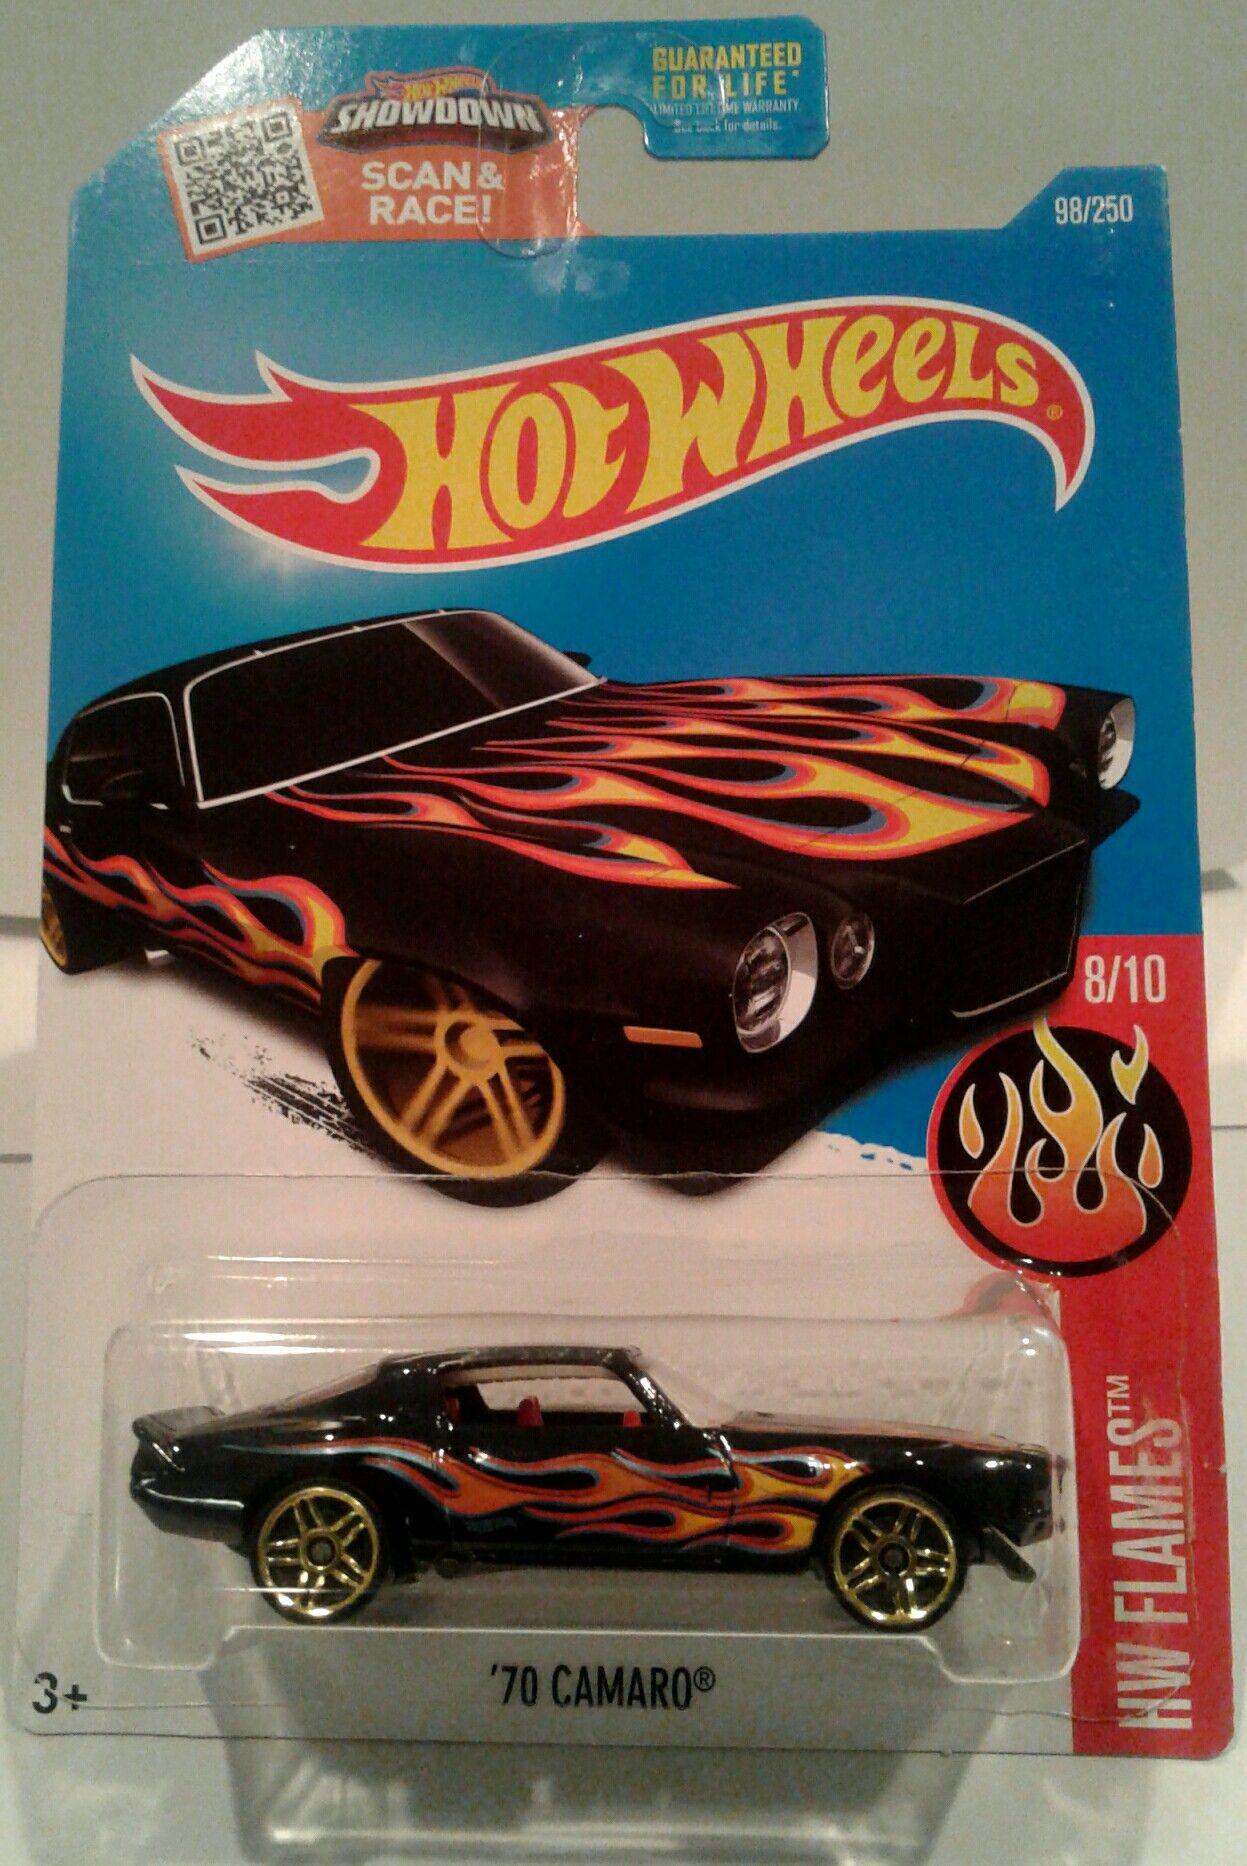 Hot Wheels 70 Camaro Price 2 00 Hot Wheels Toys Mattel Hot